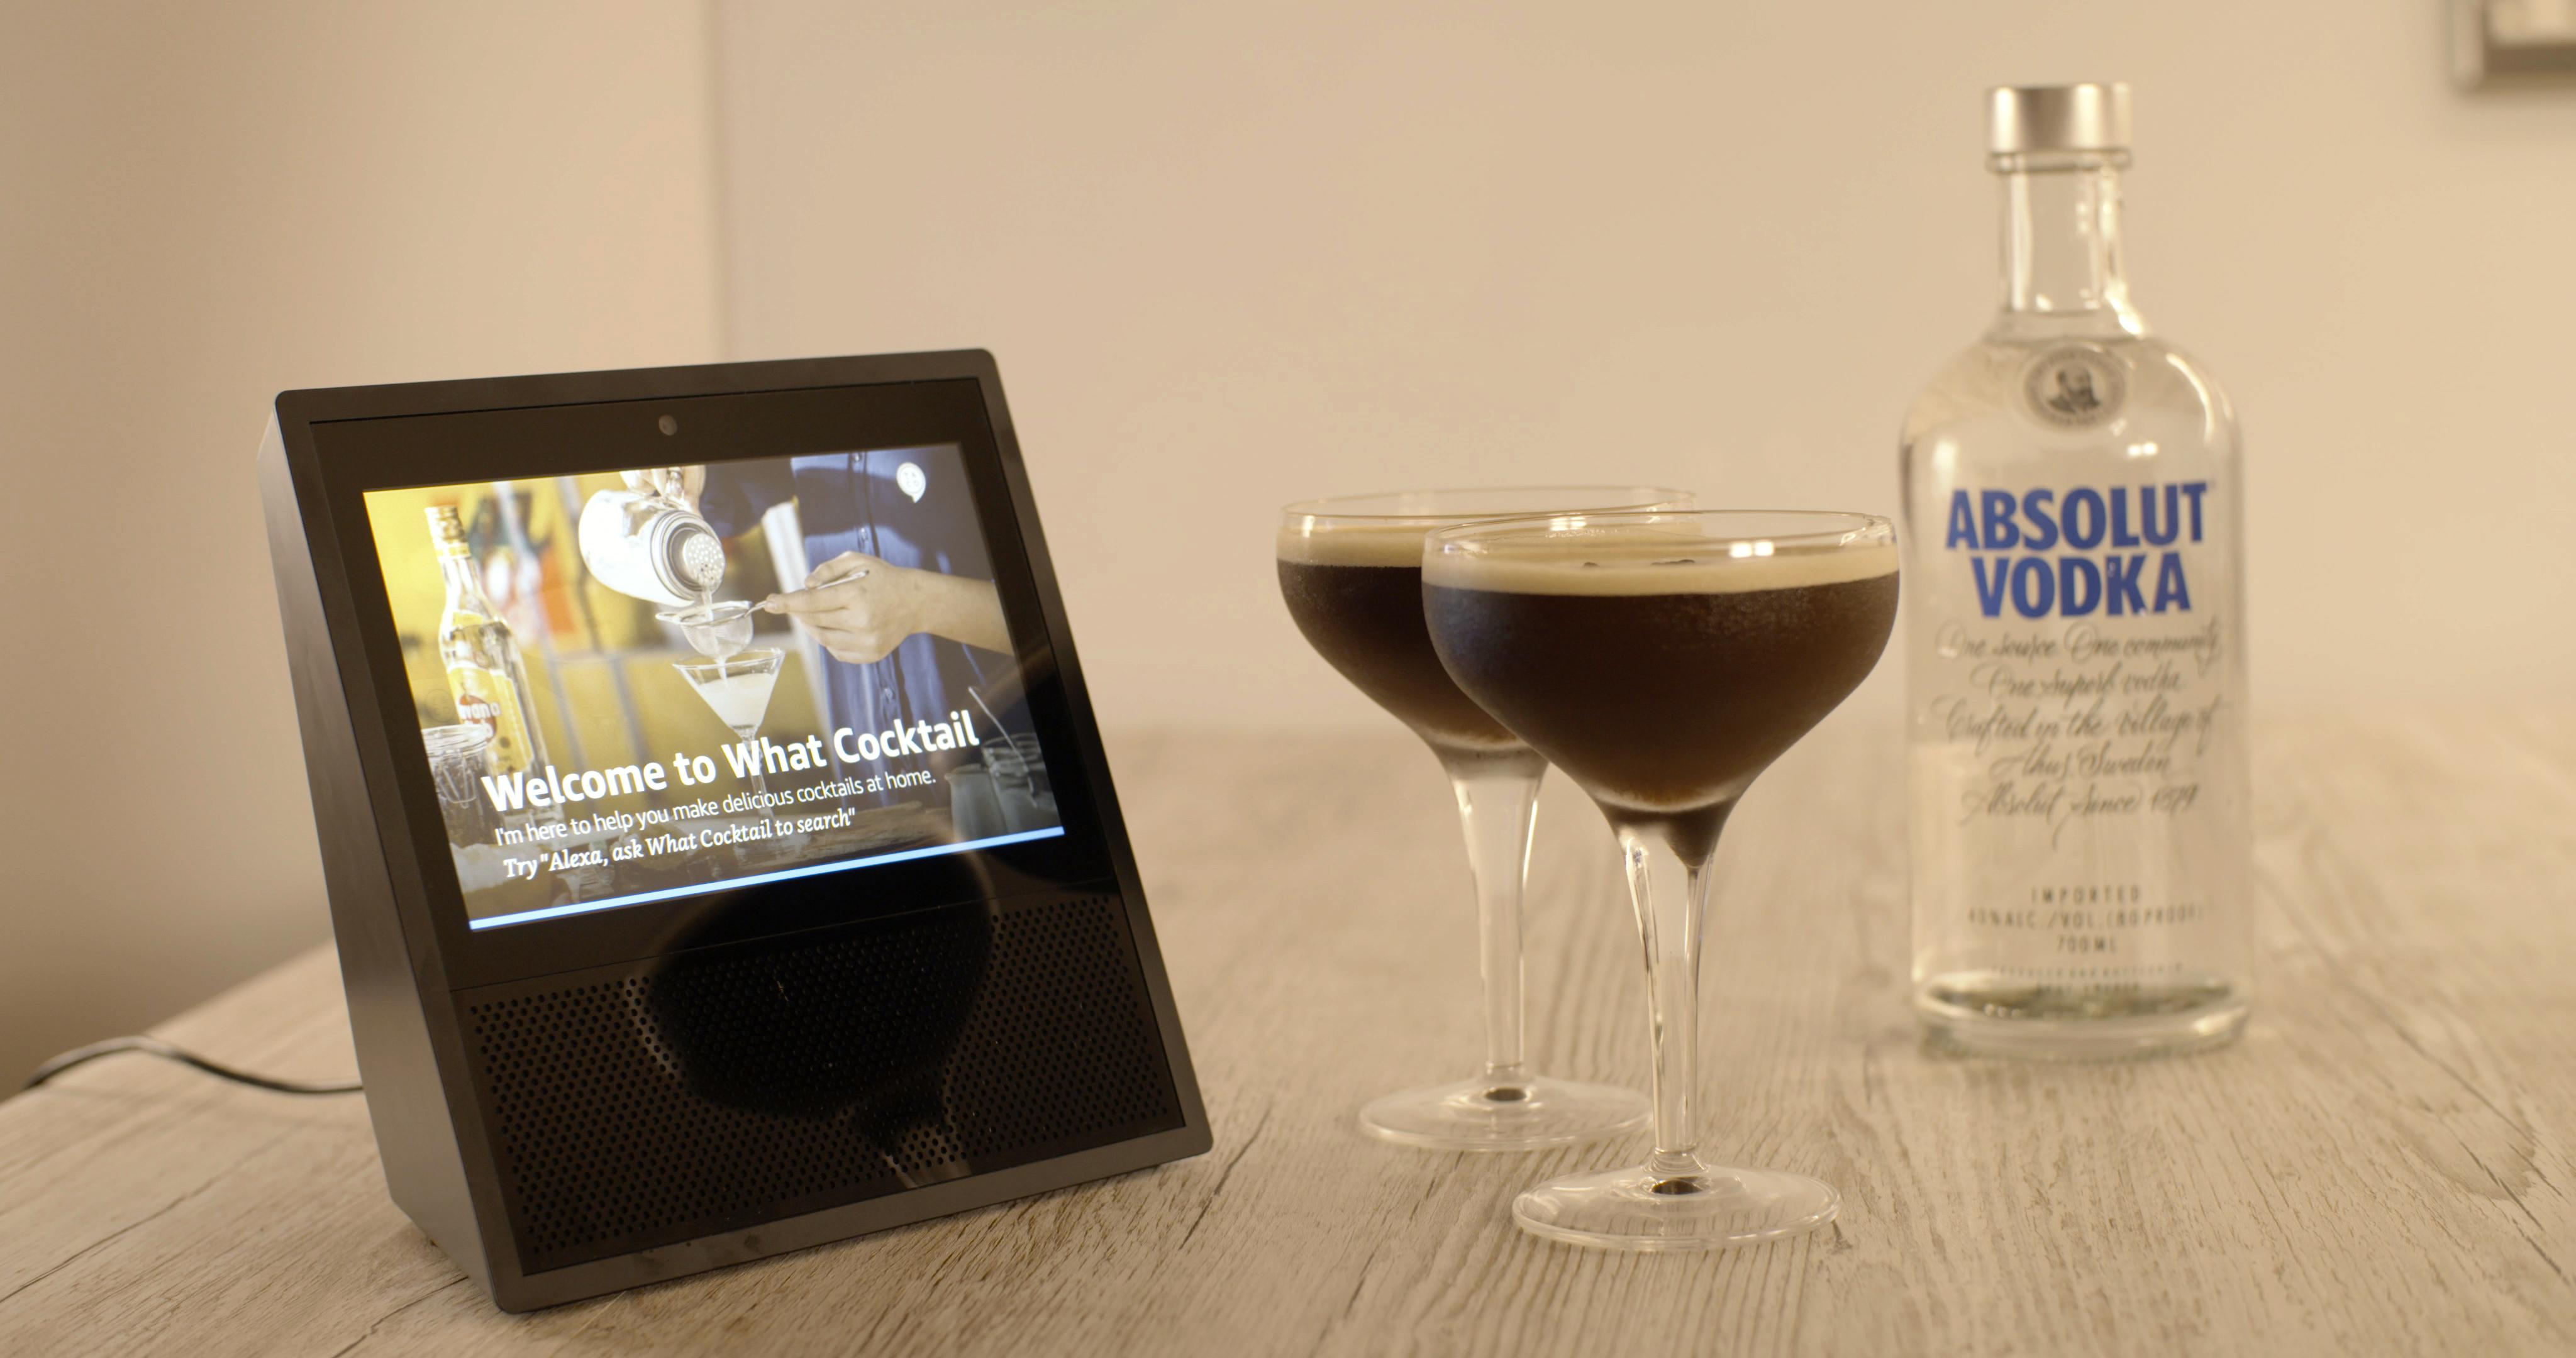 Pernod Ups Digital Marketing With Amazon Show photo